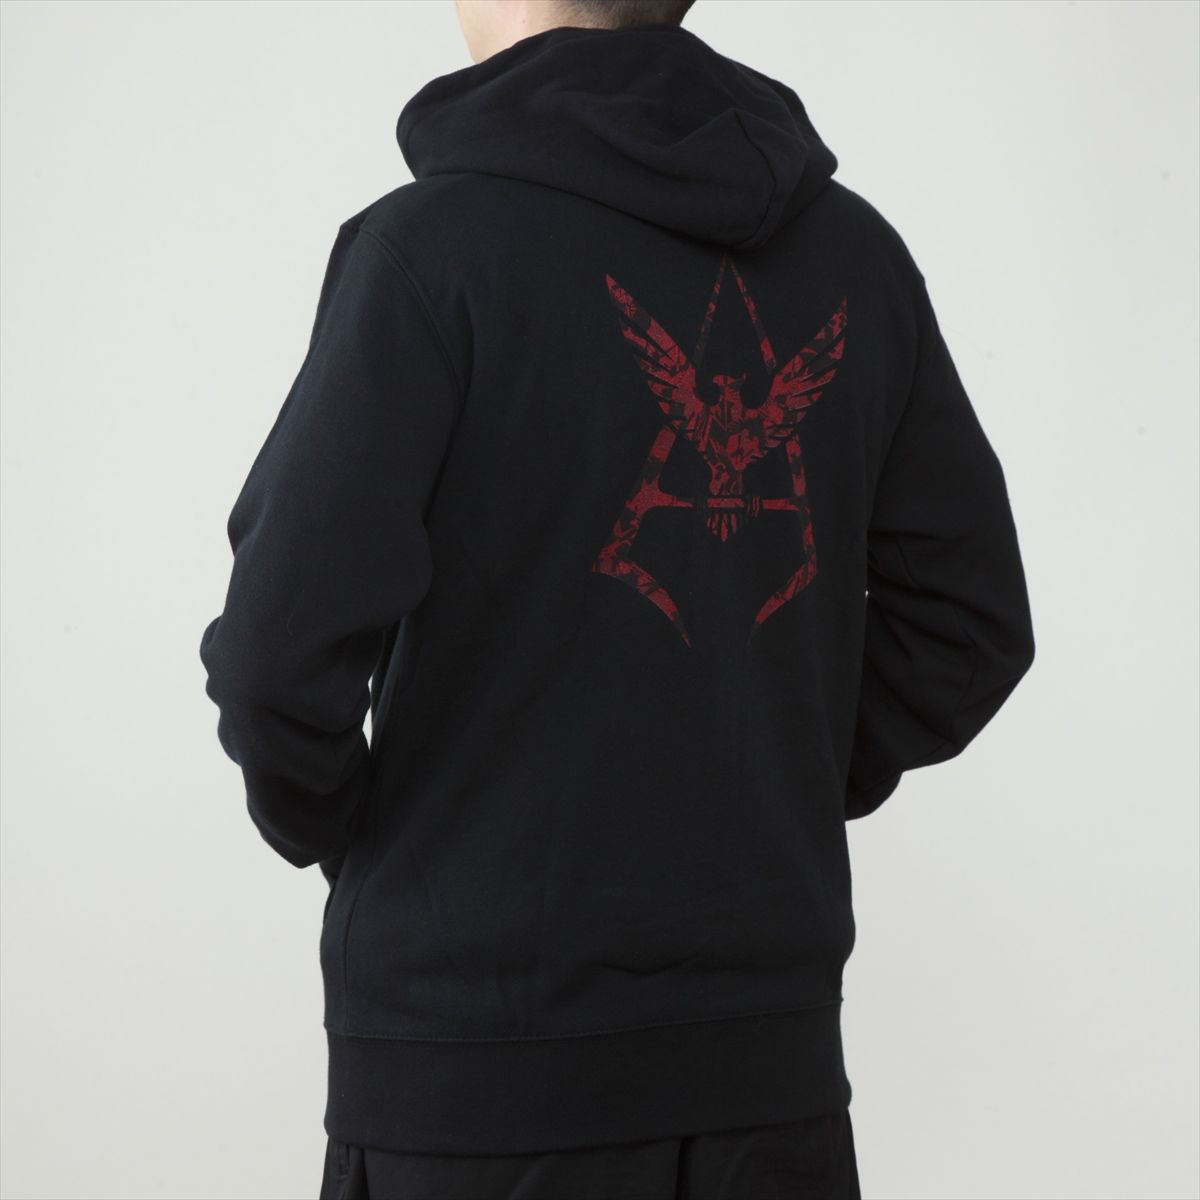 Mobile Suit Gundam Camouflage Pattern Char Aznable Emblem Hoodie